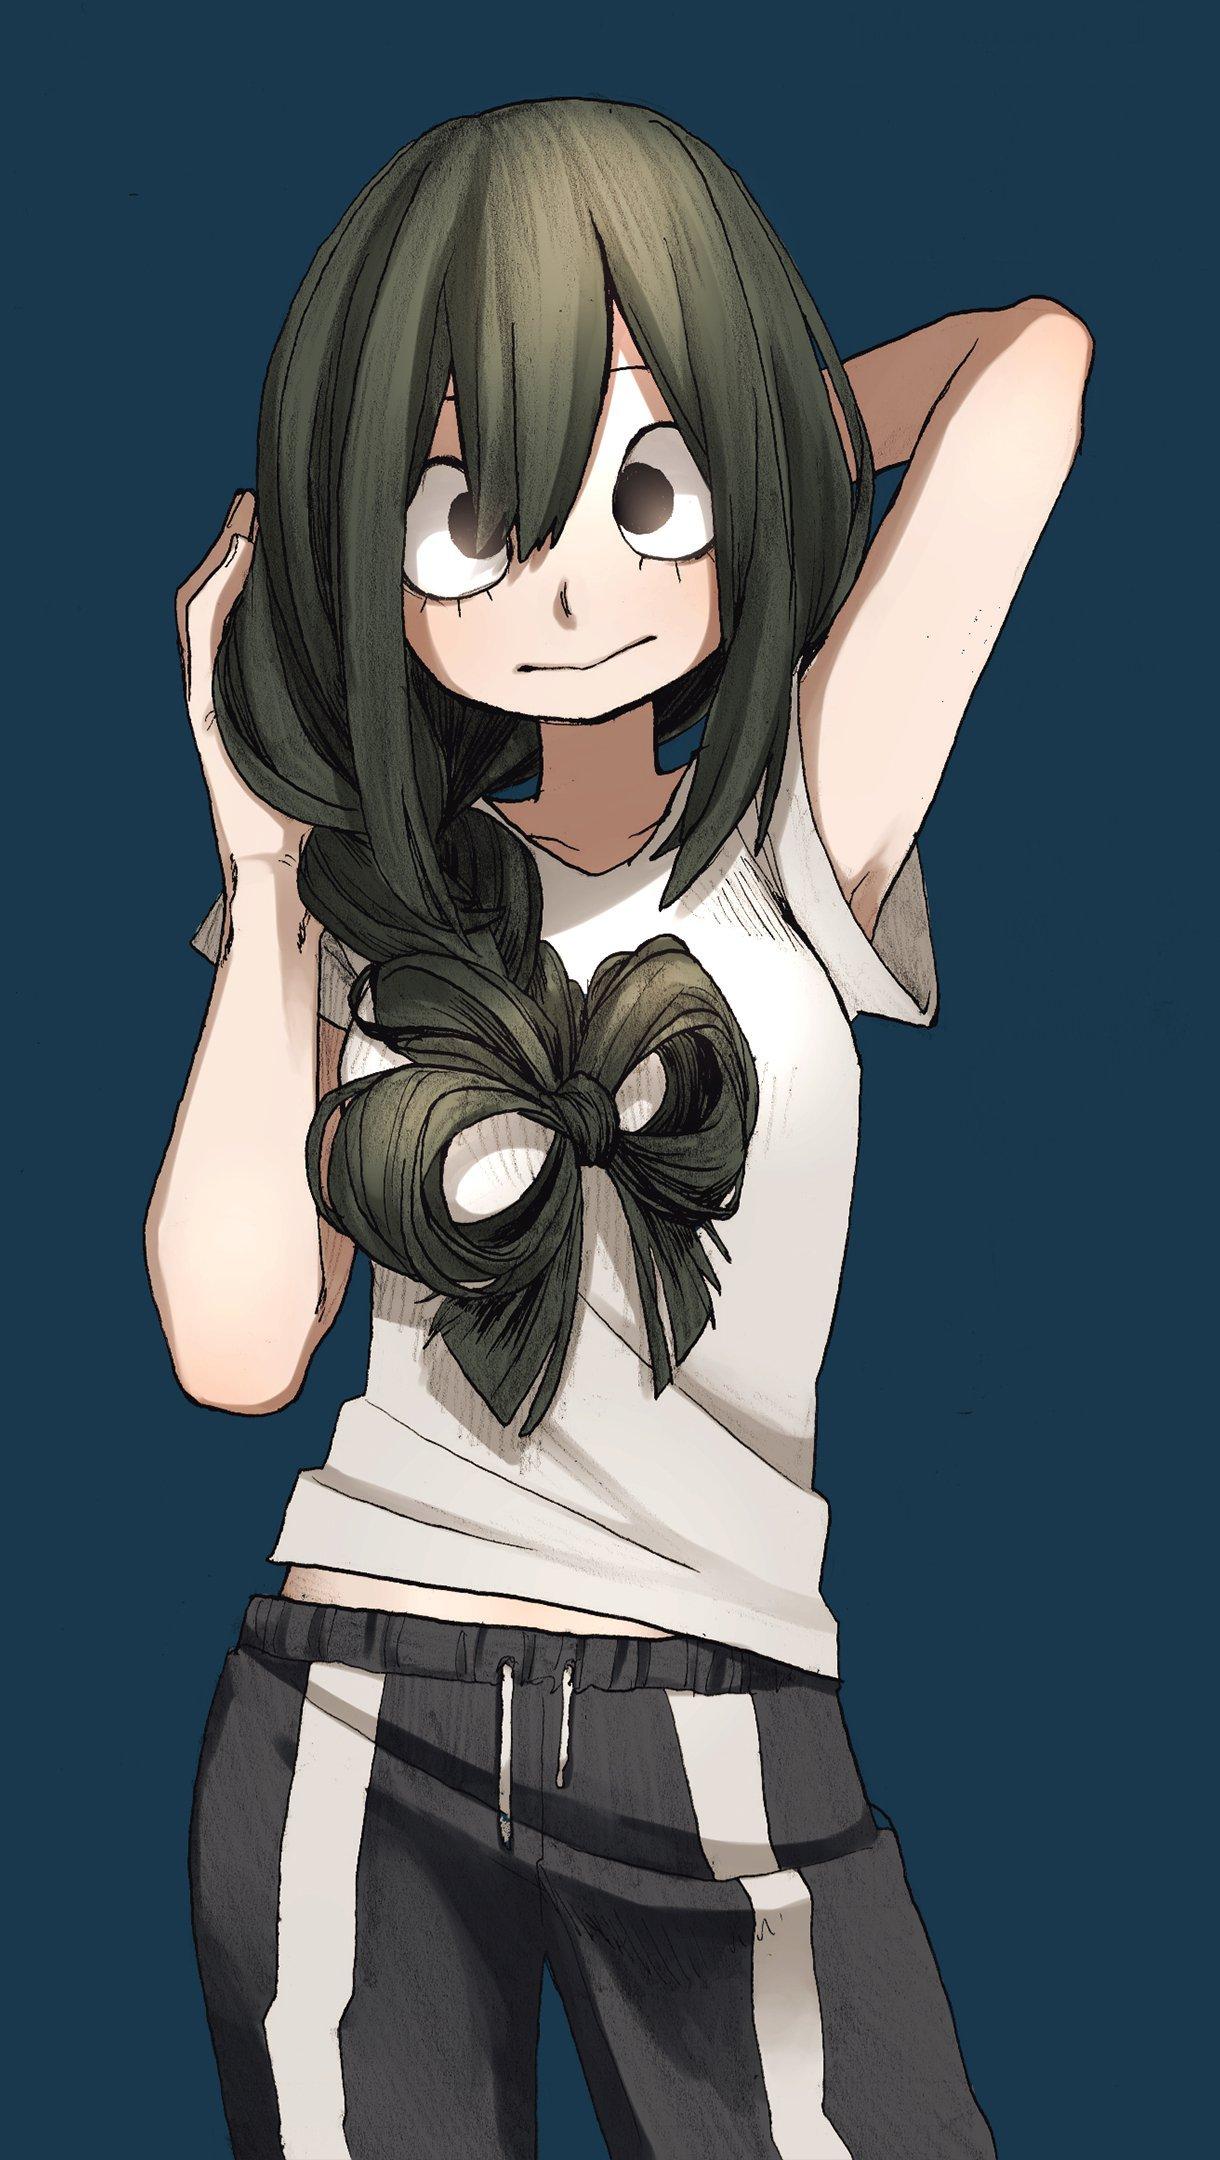 Anime Wallpaper Tsuyu Asui from My Hero Academia Vertical